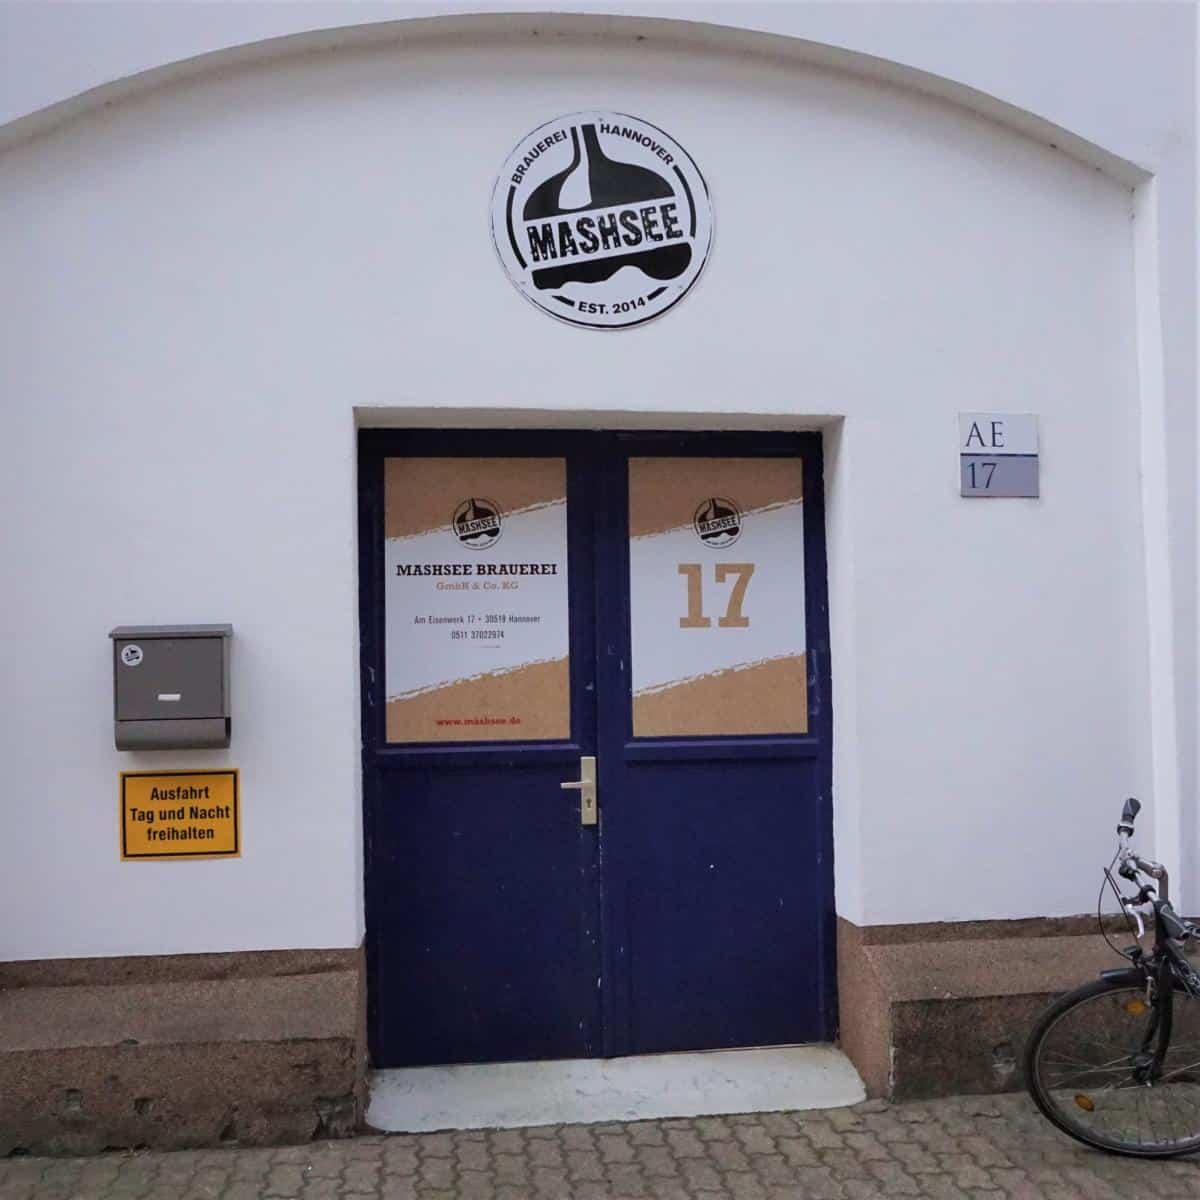 Style Hannover Mashsee Brauerei 5 - Mashsee Brauerei – Craft Beer aus Hannover